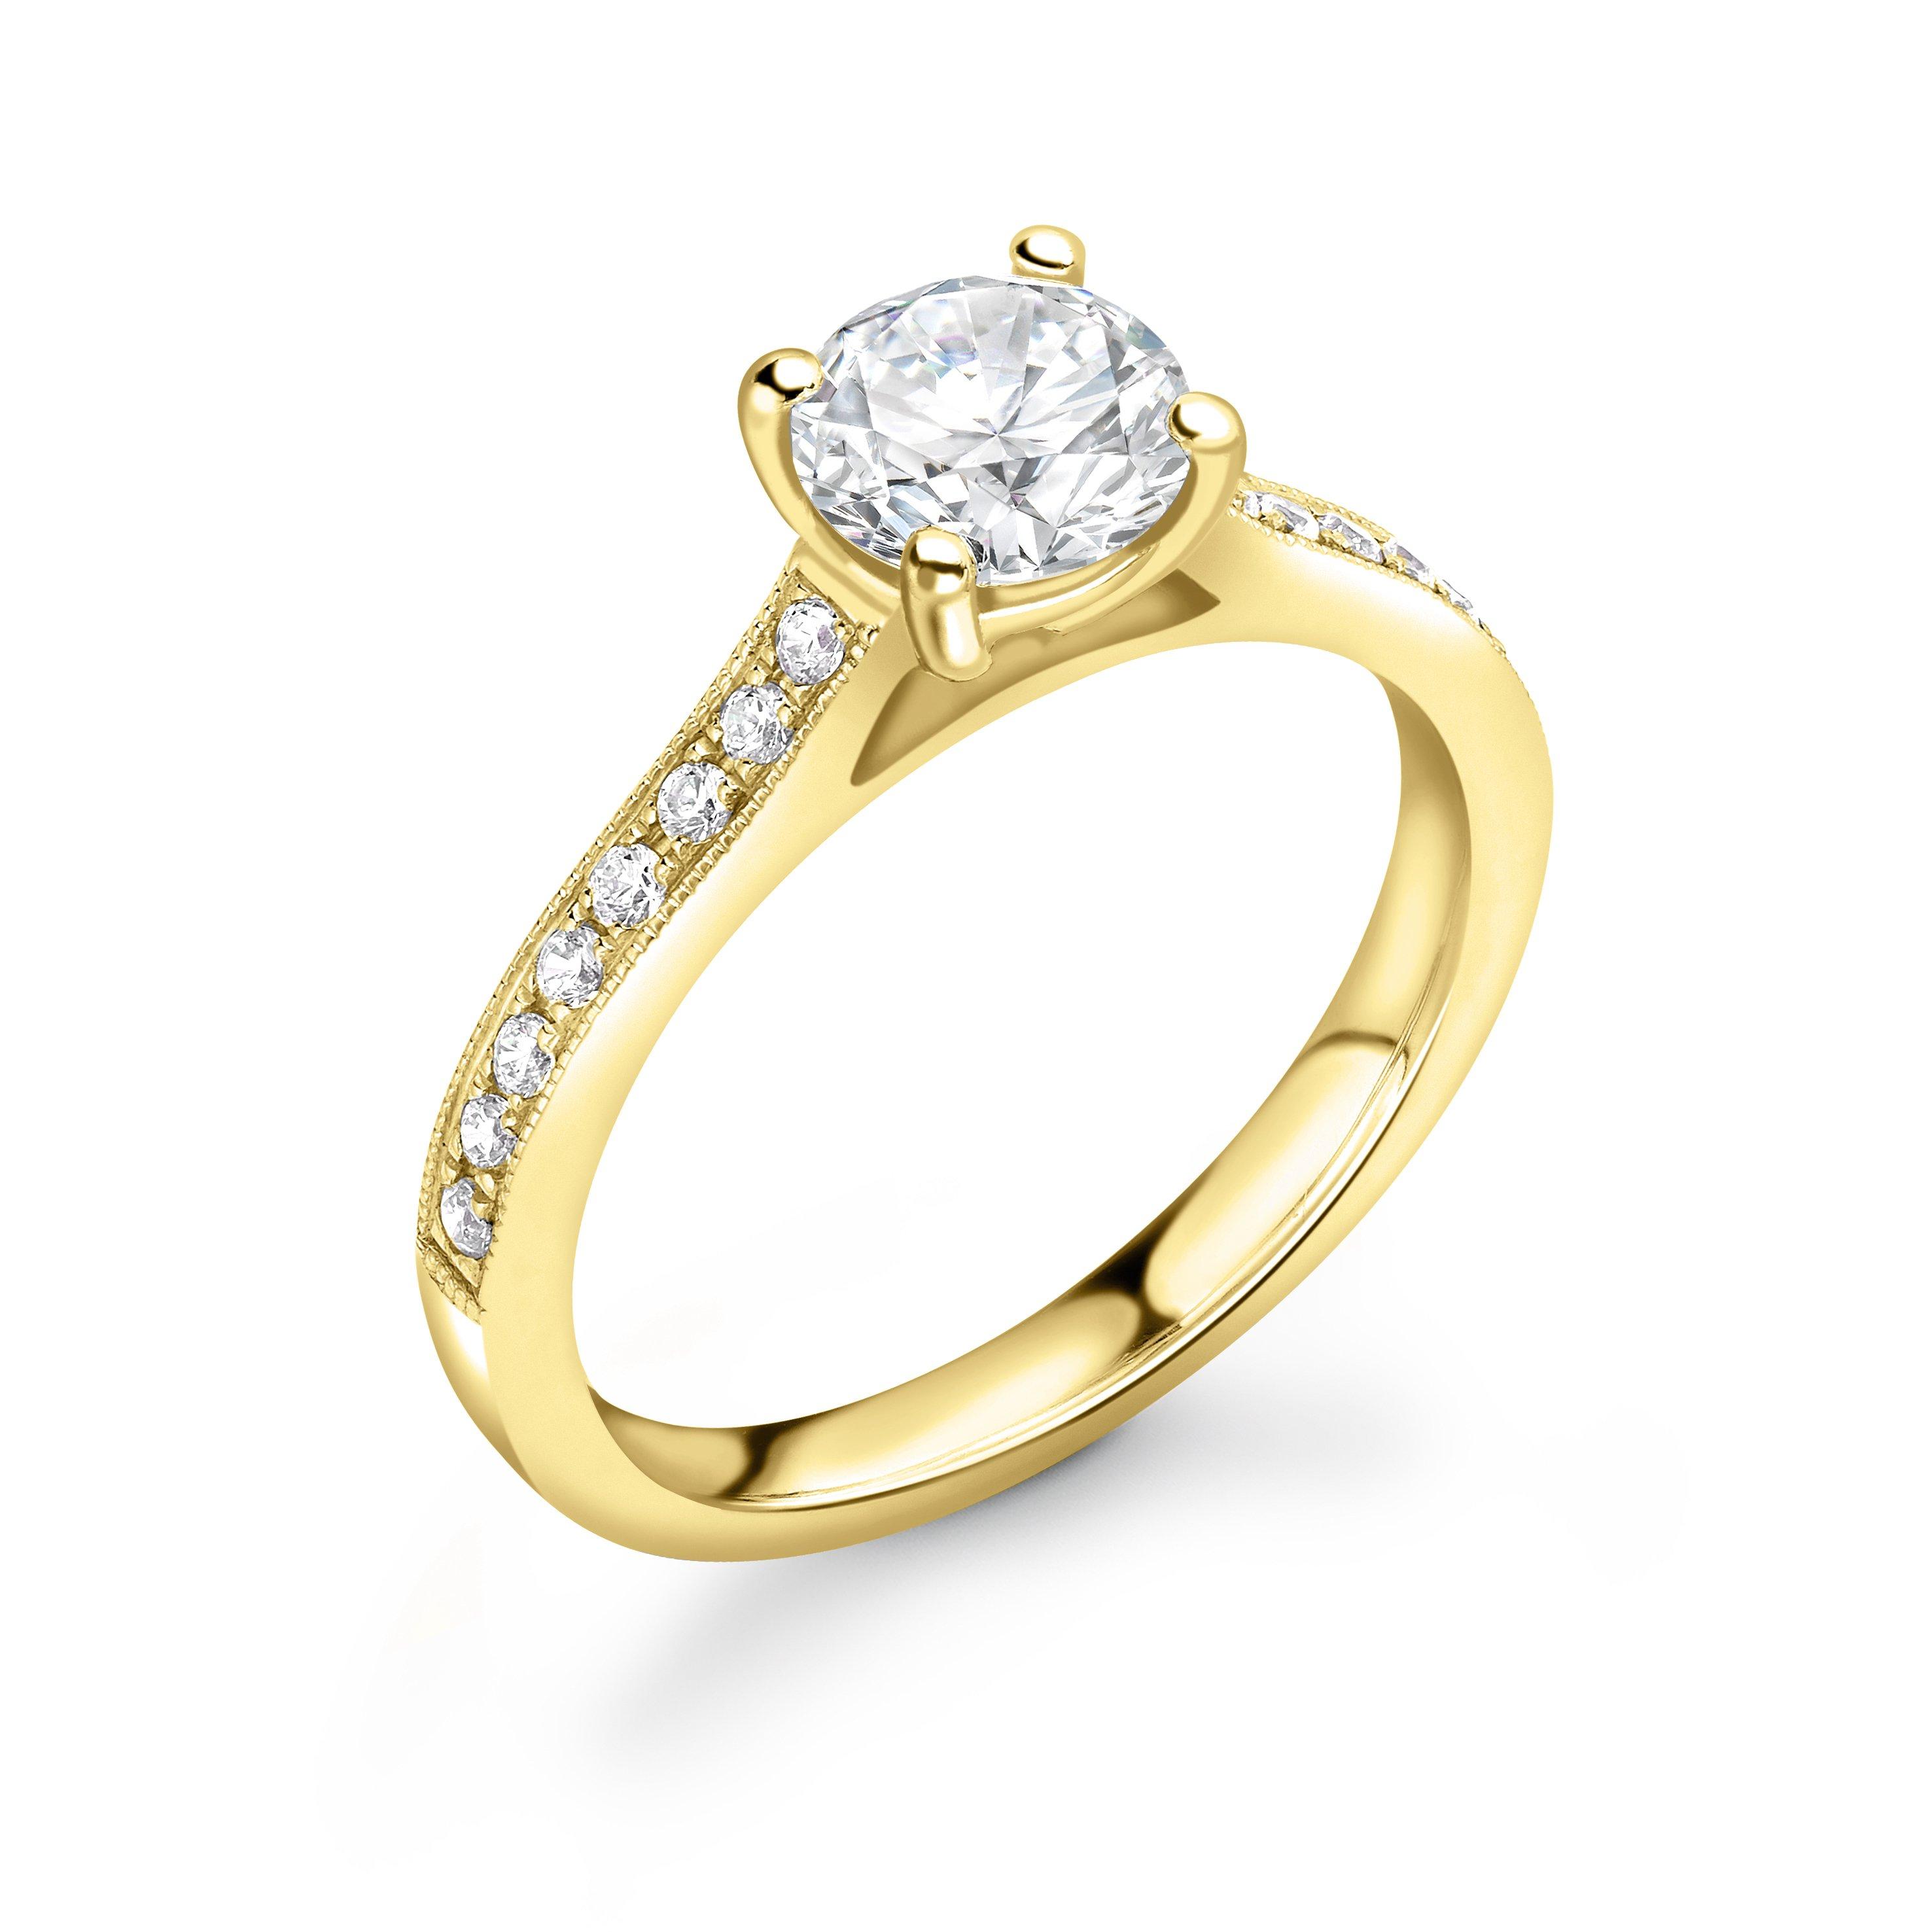 Miligrain Edge Shoulder Classic Side Stone Diamond Engagement Rings